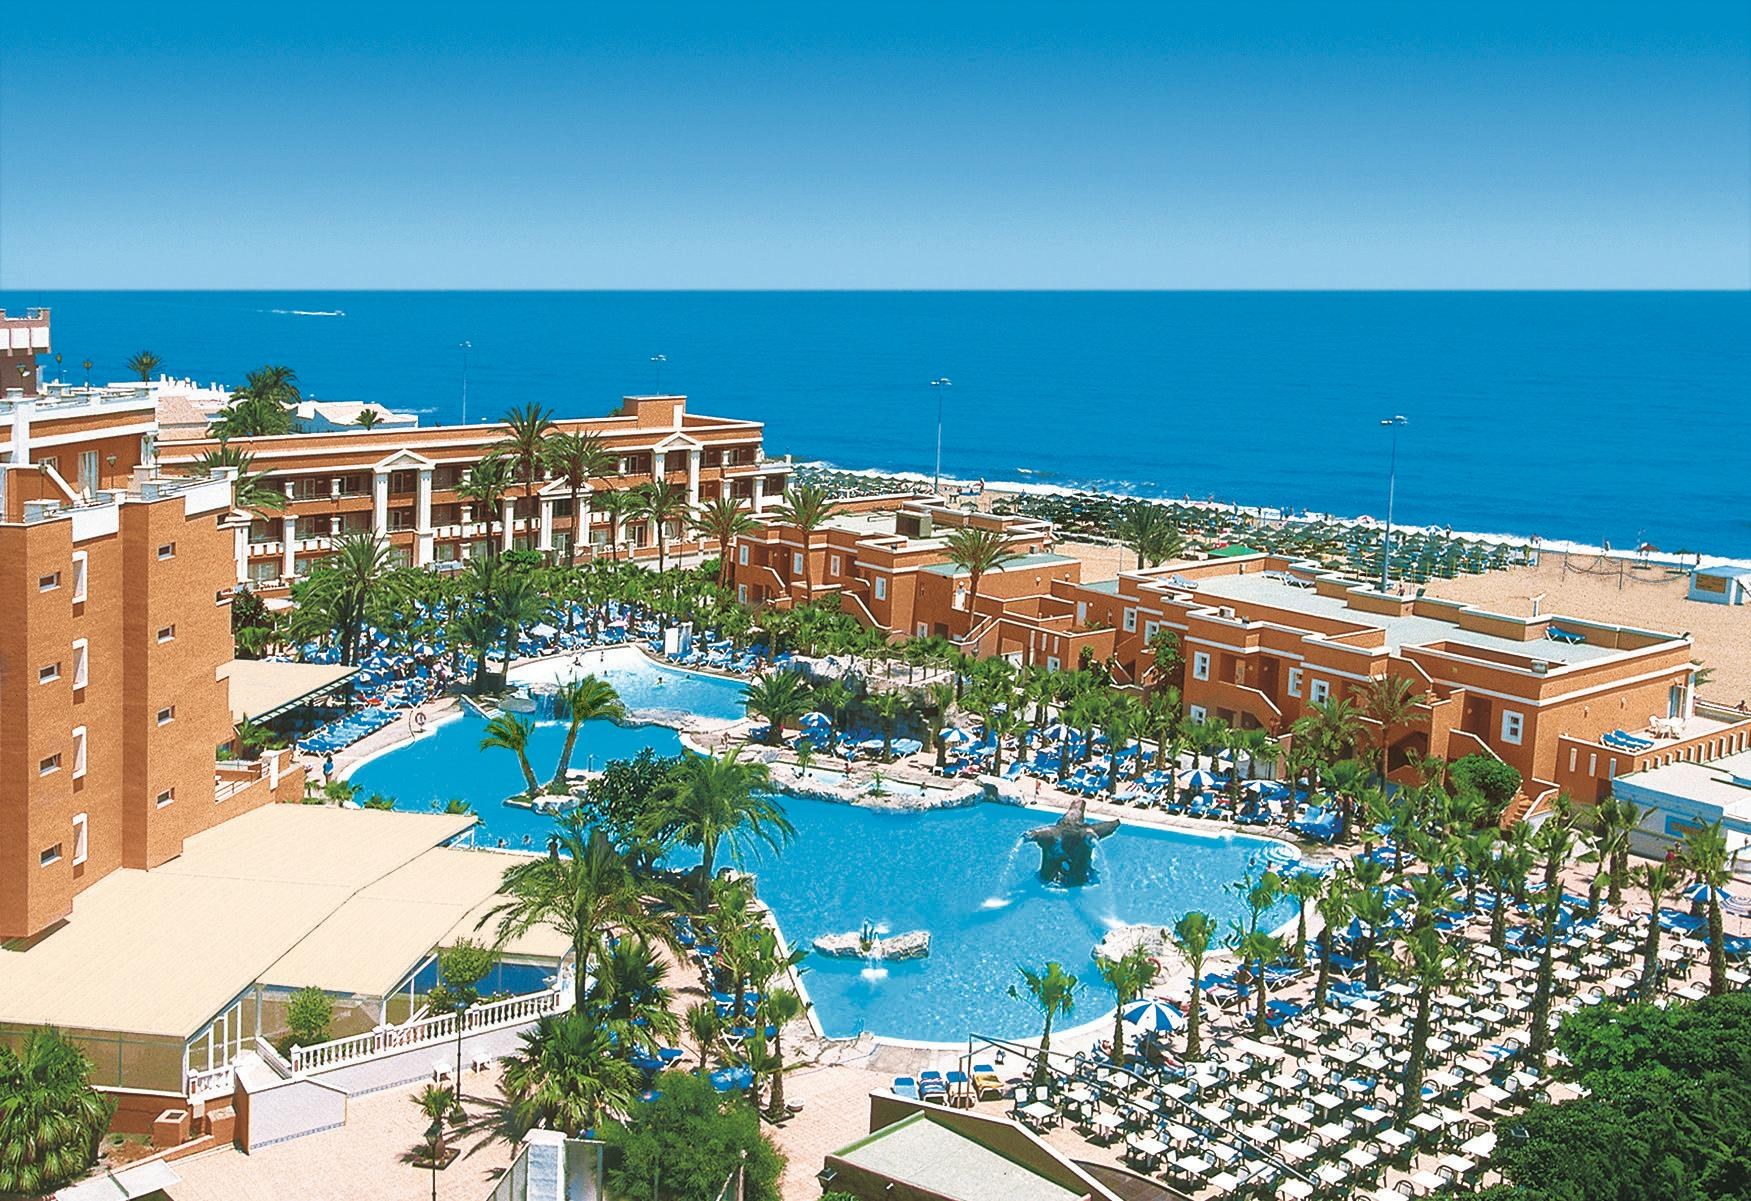 Andalusien Hotel Direkt Am Strand